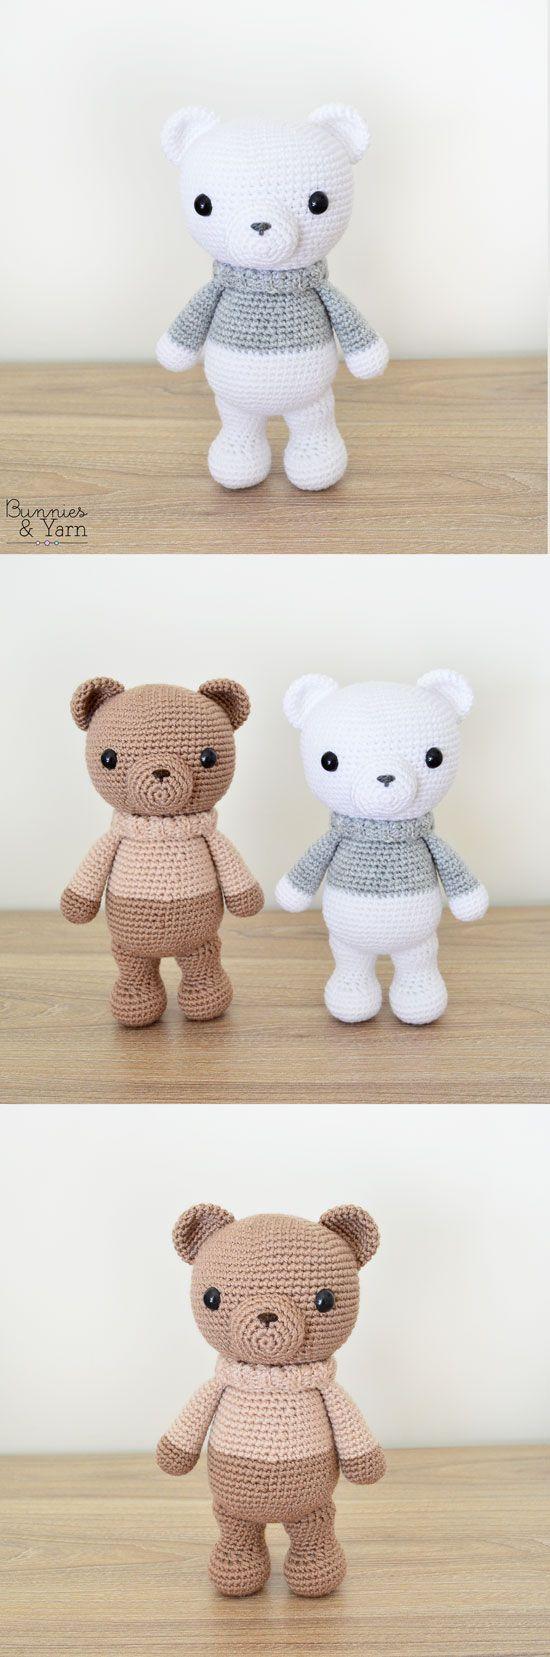 Crochet Pattern - Xander the Lovely Winter Bear - Amigurumi | Osos ...